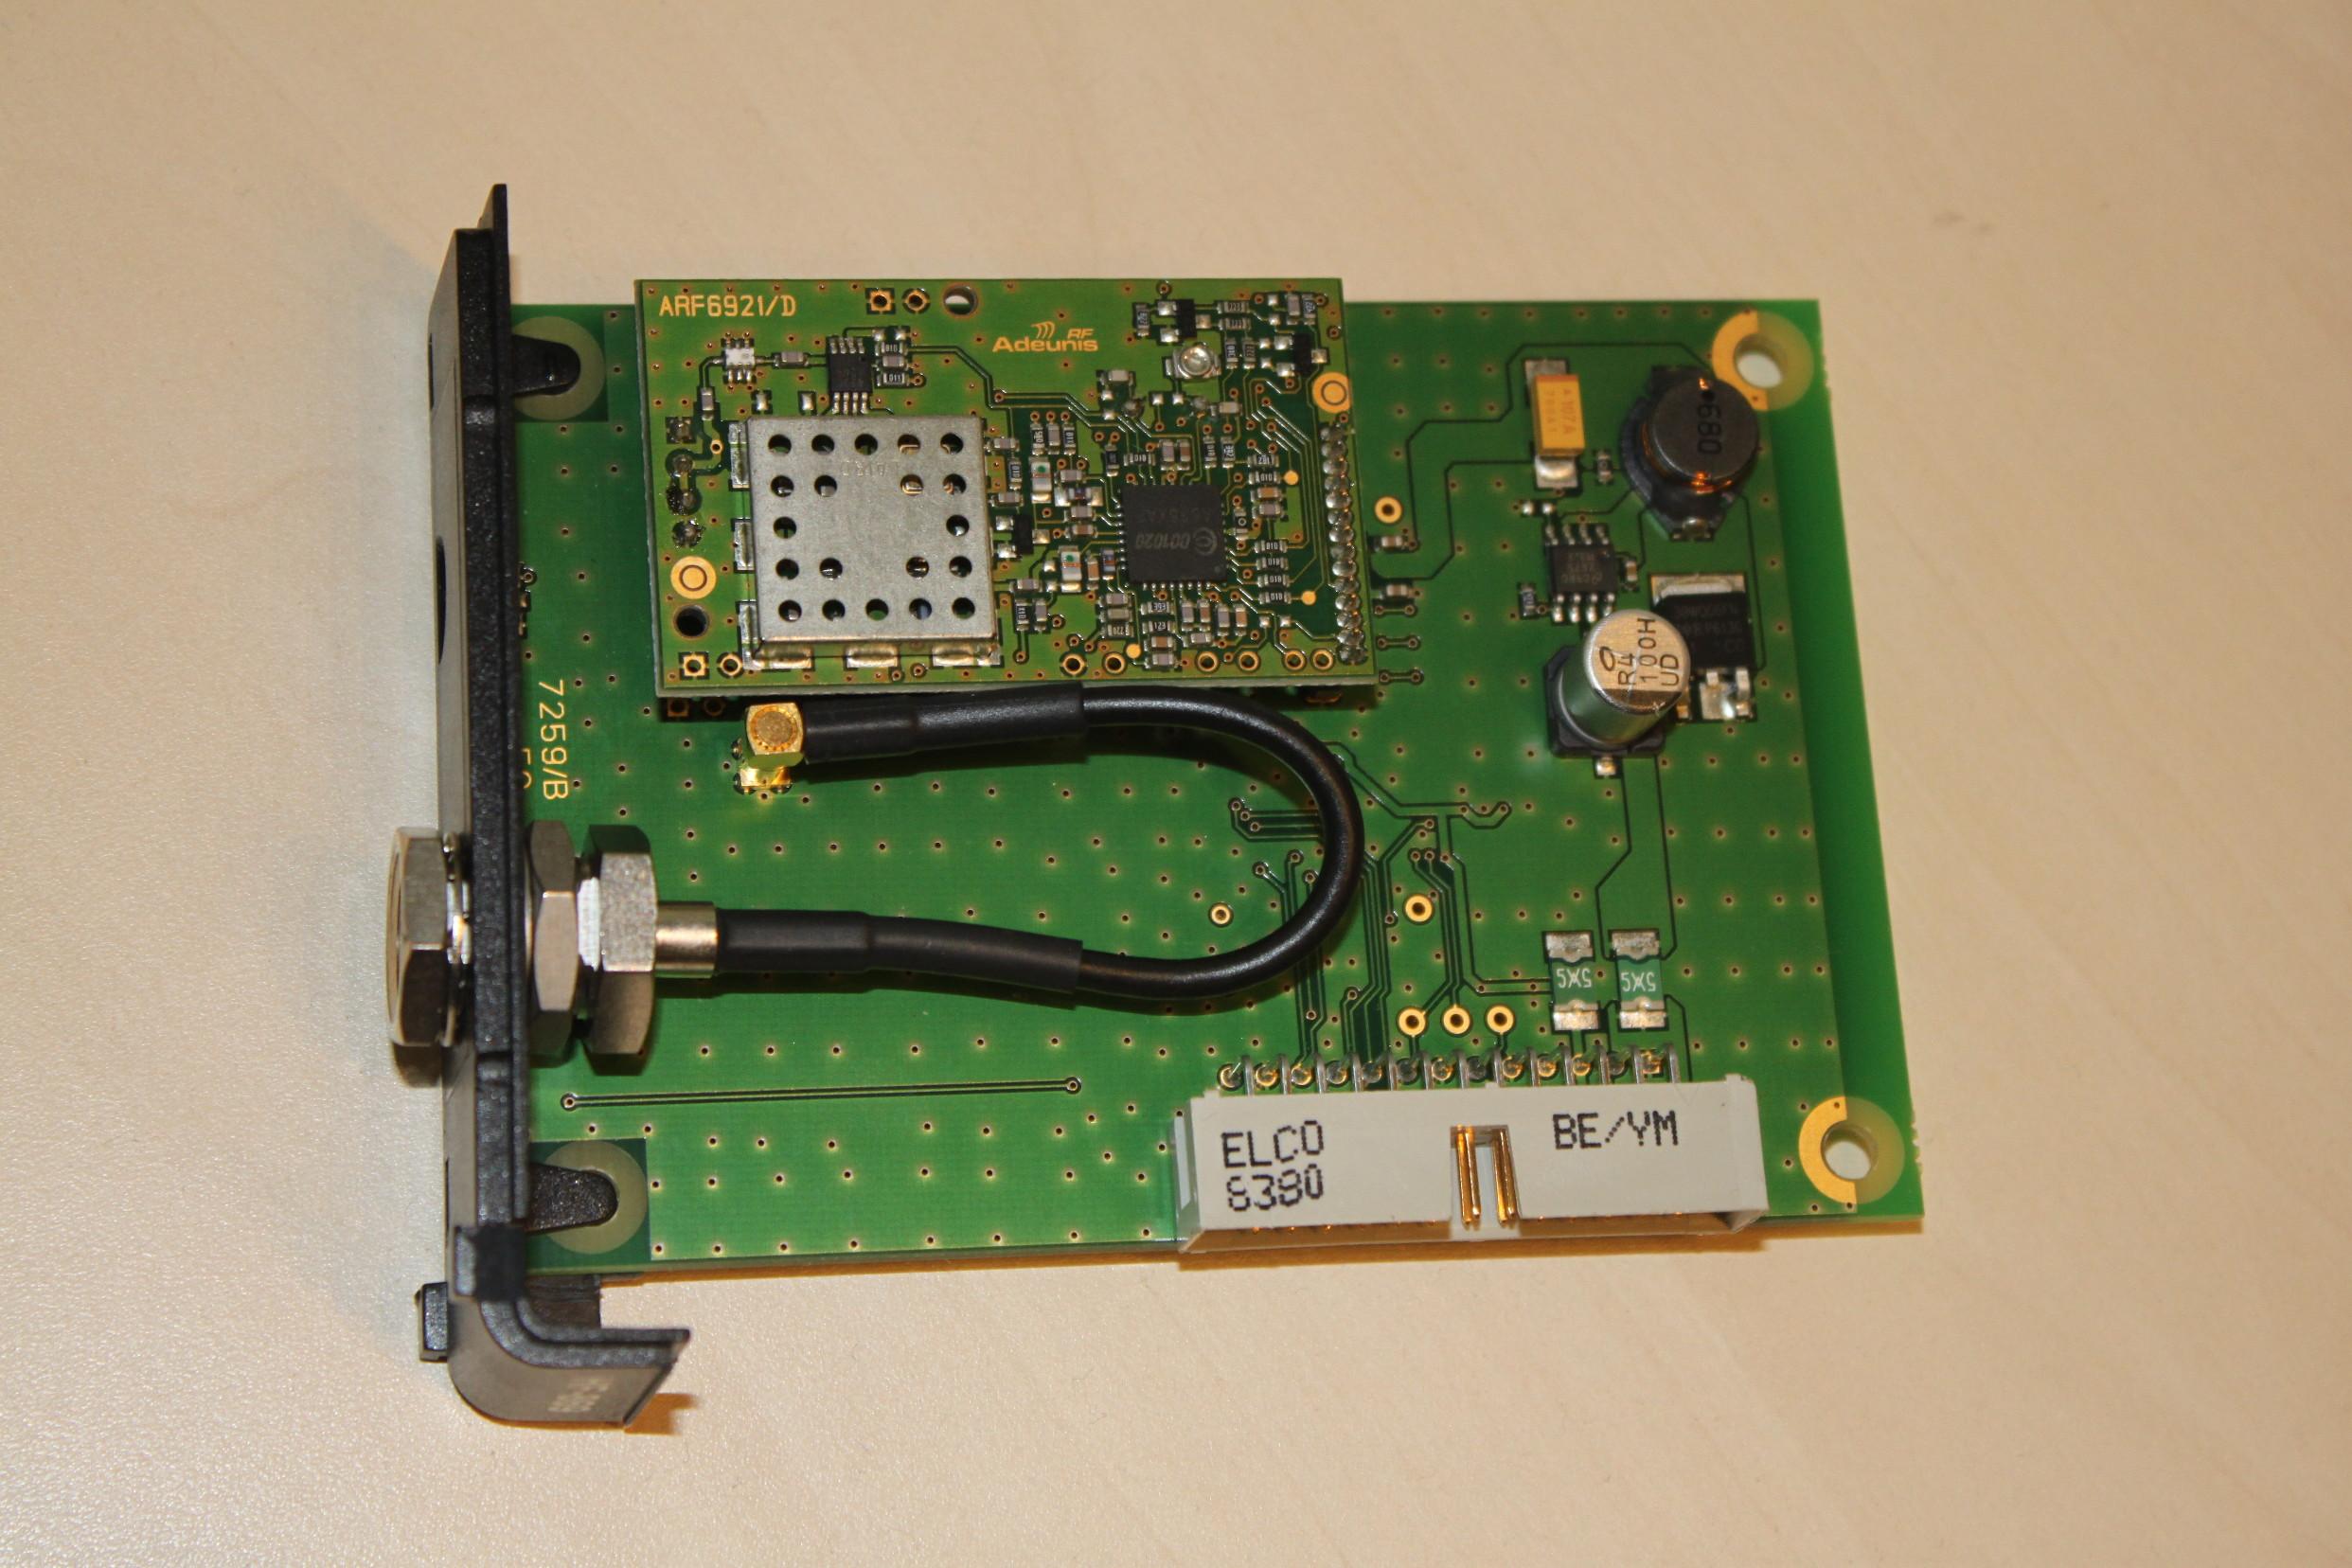 Carte de communication radio d'un automate industriel